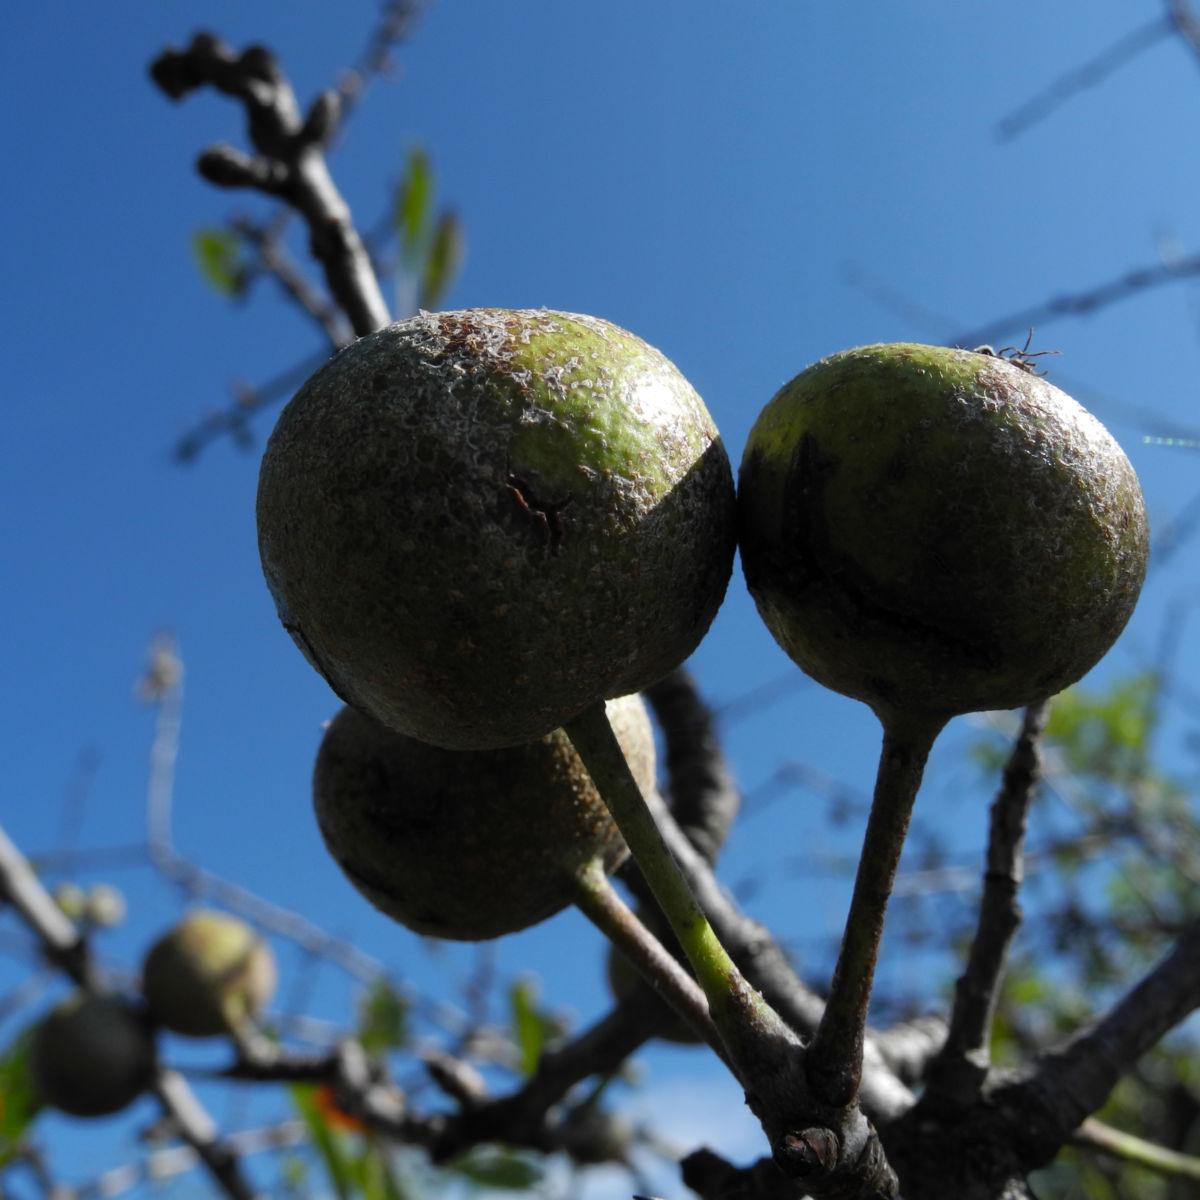 Holzapfel Frucht gruen Malus sylvestris